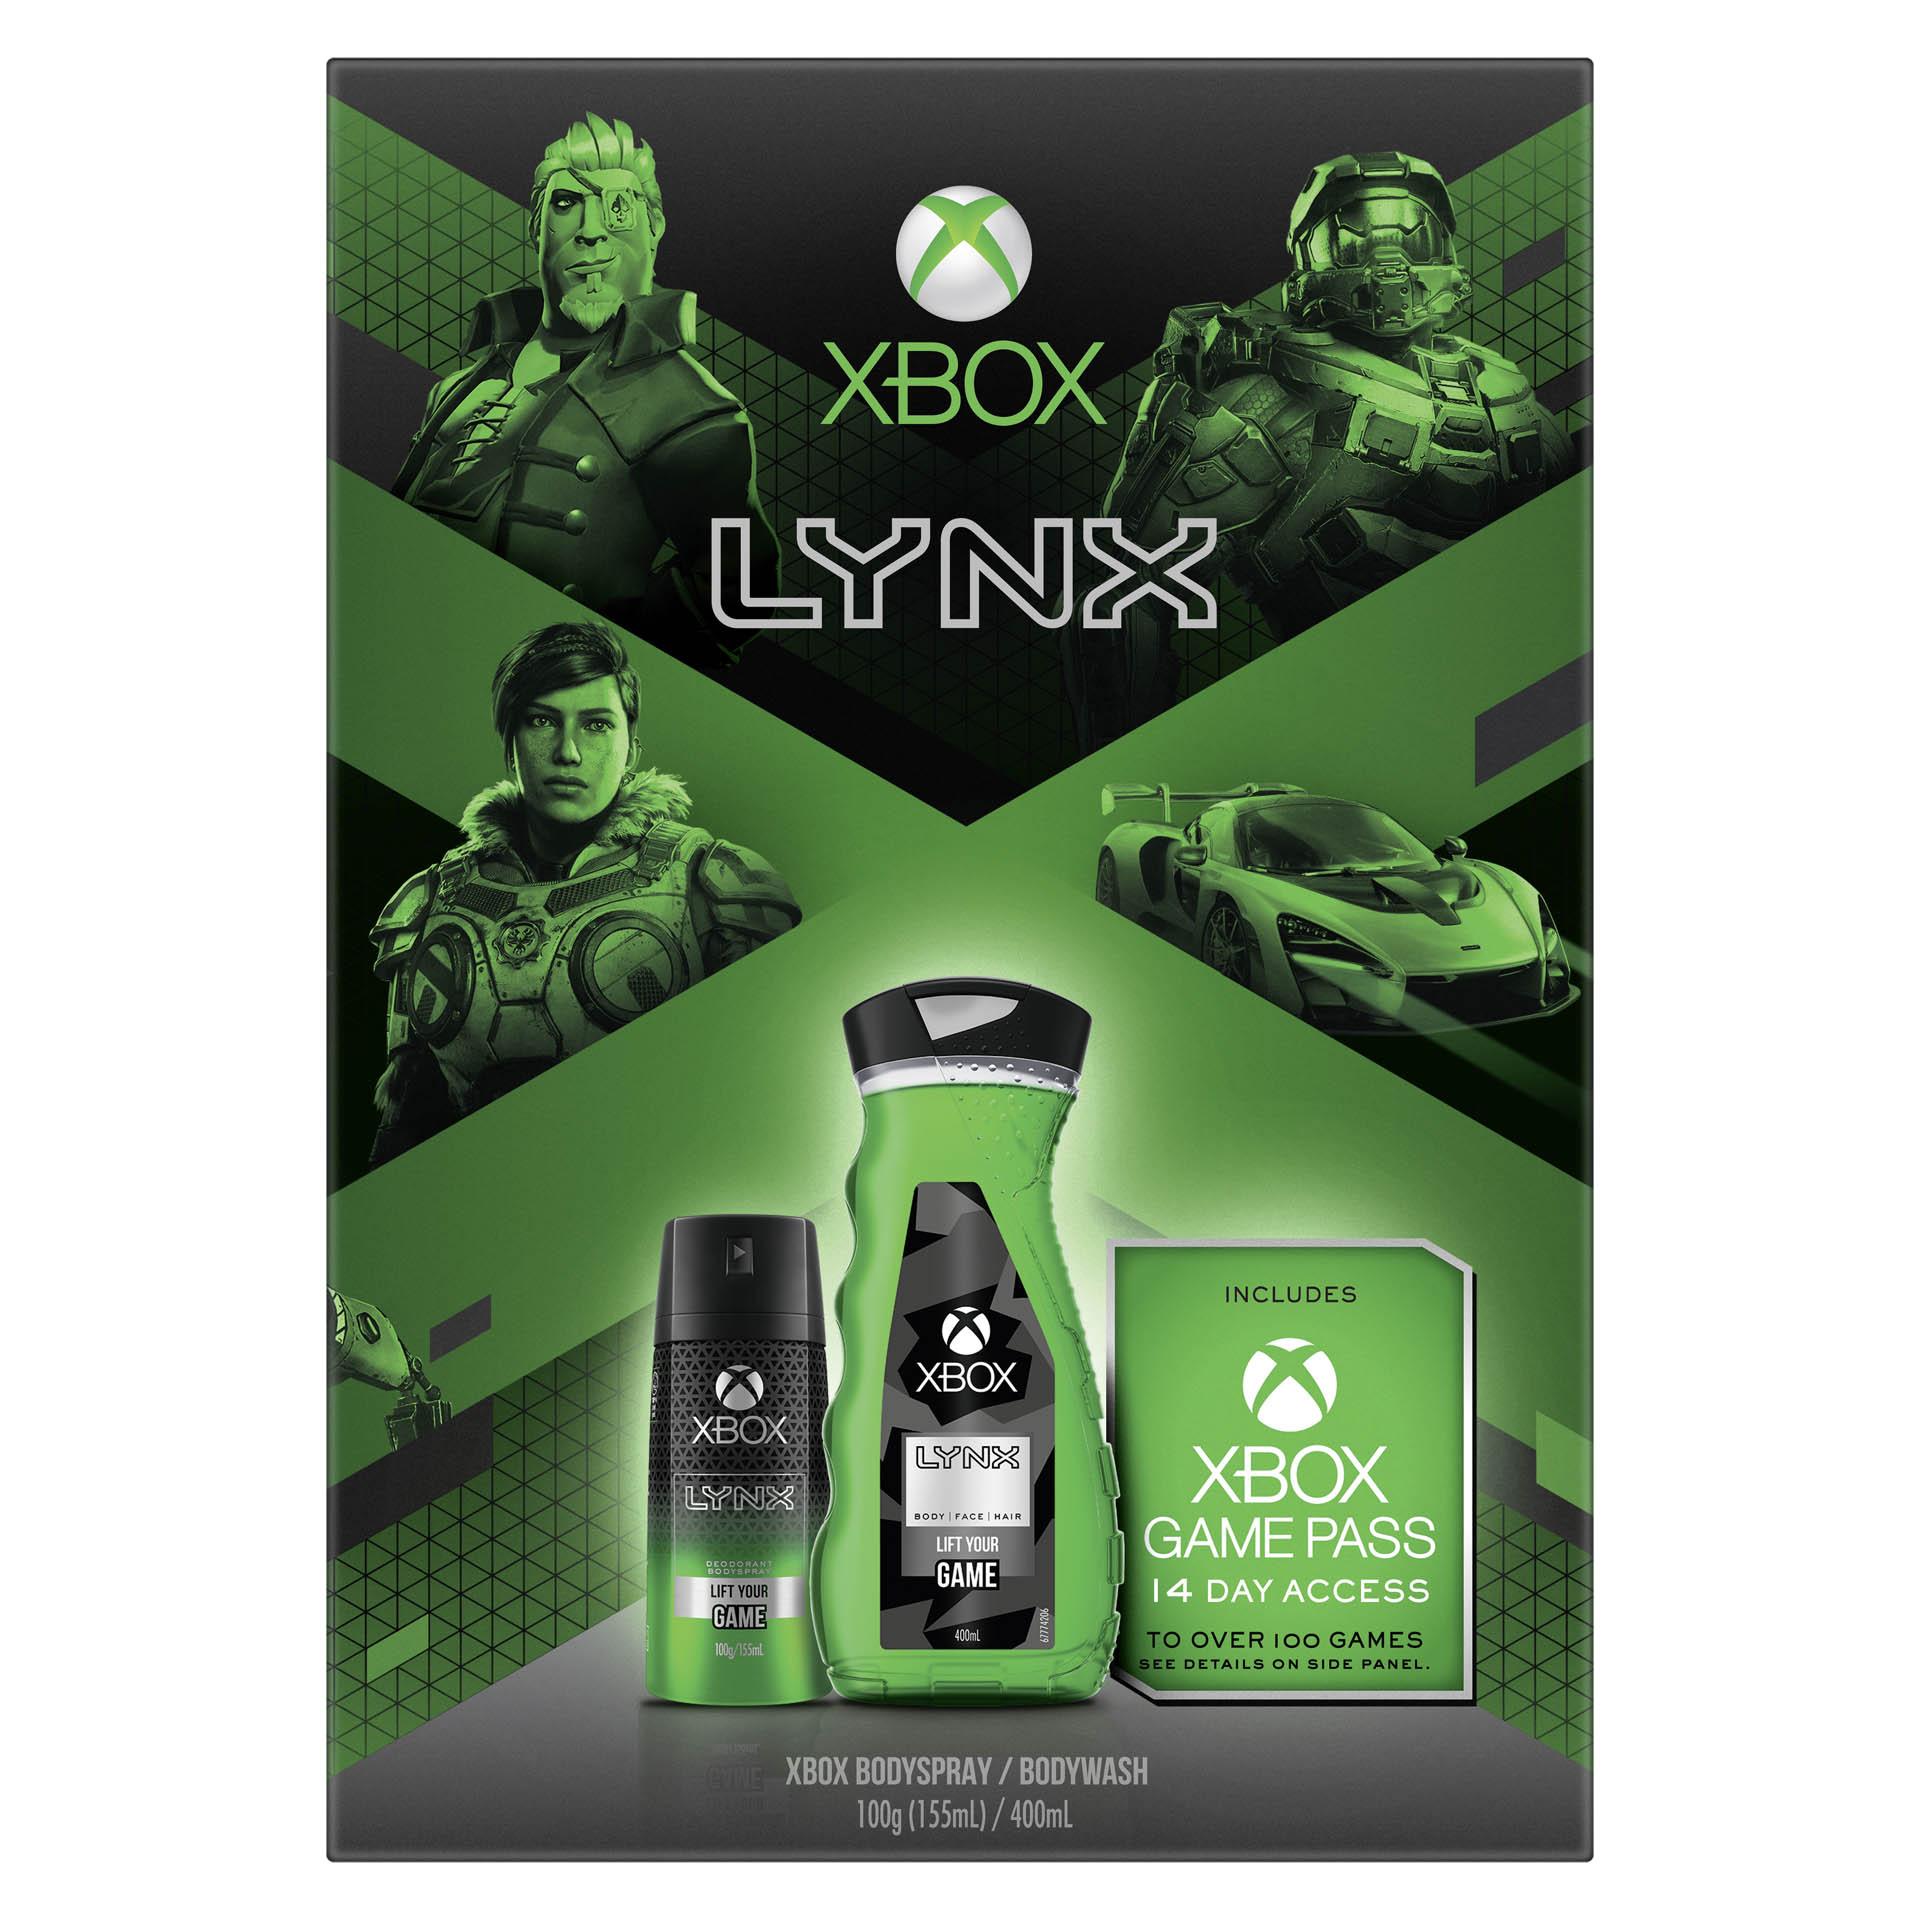 Xbox and Lynx eSports